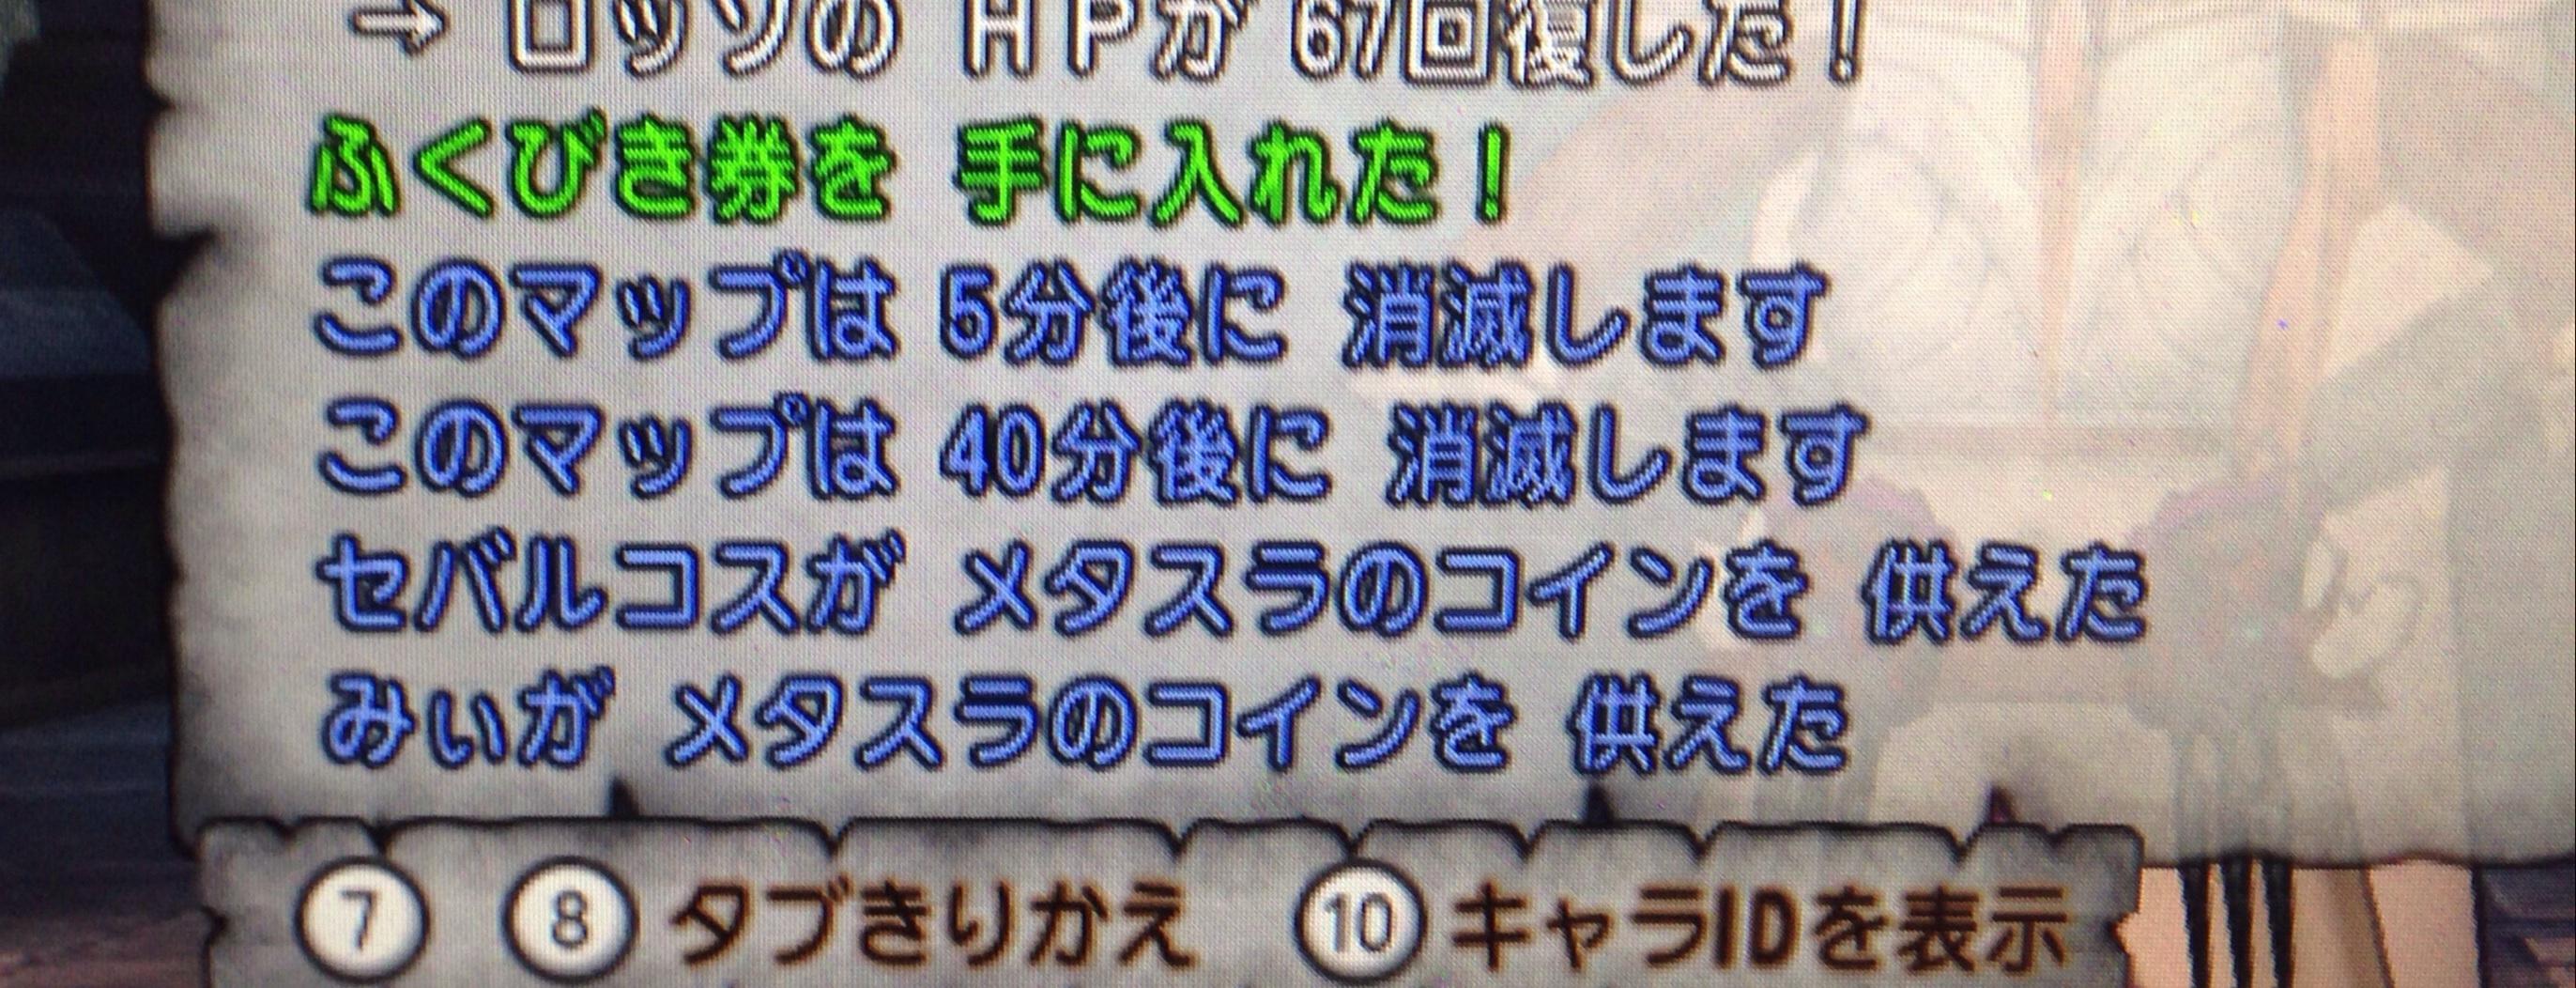 2013101909372944e.jpg